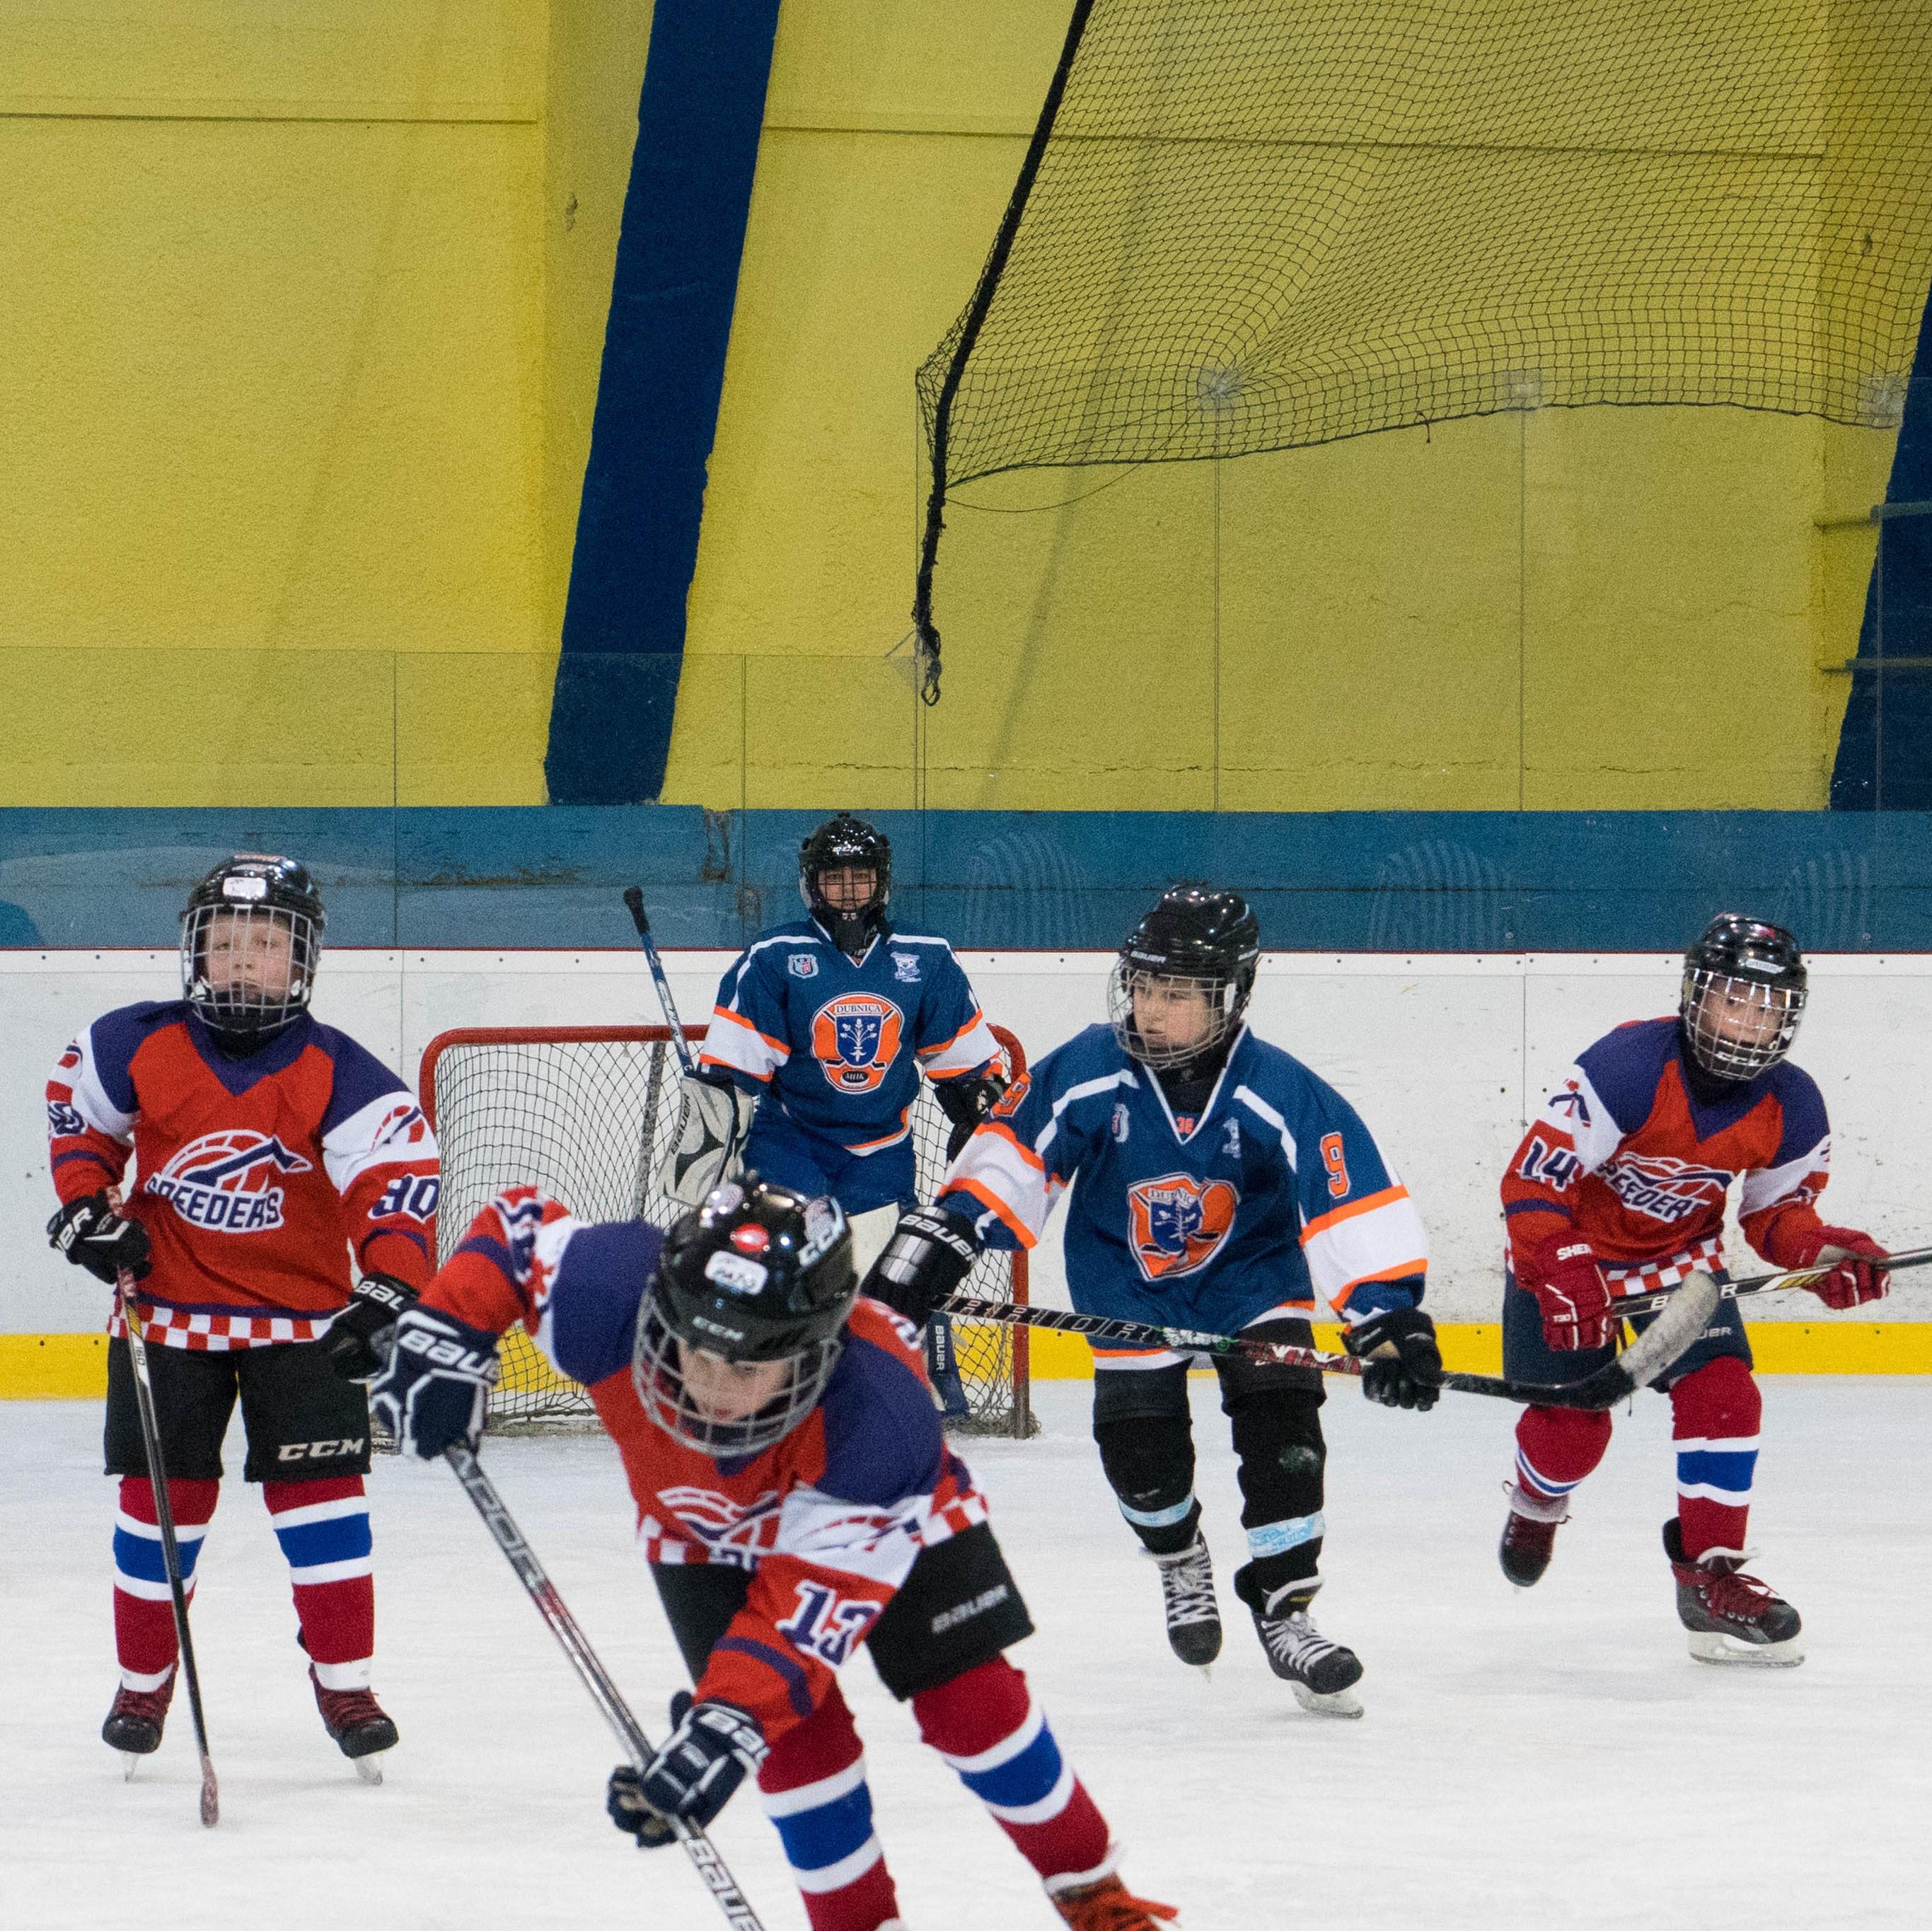 hokejovy turnaj Puchov 2.miesto speeders bratislava 7